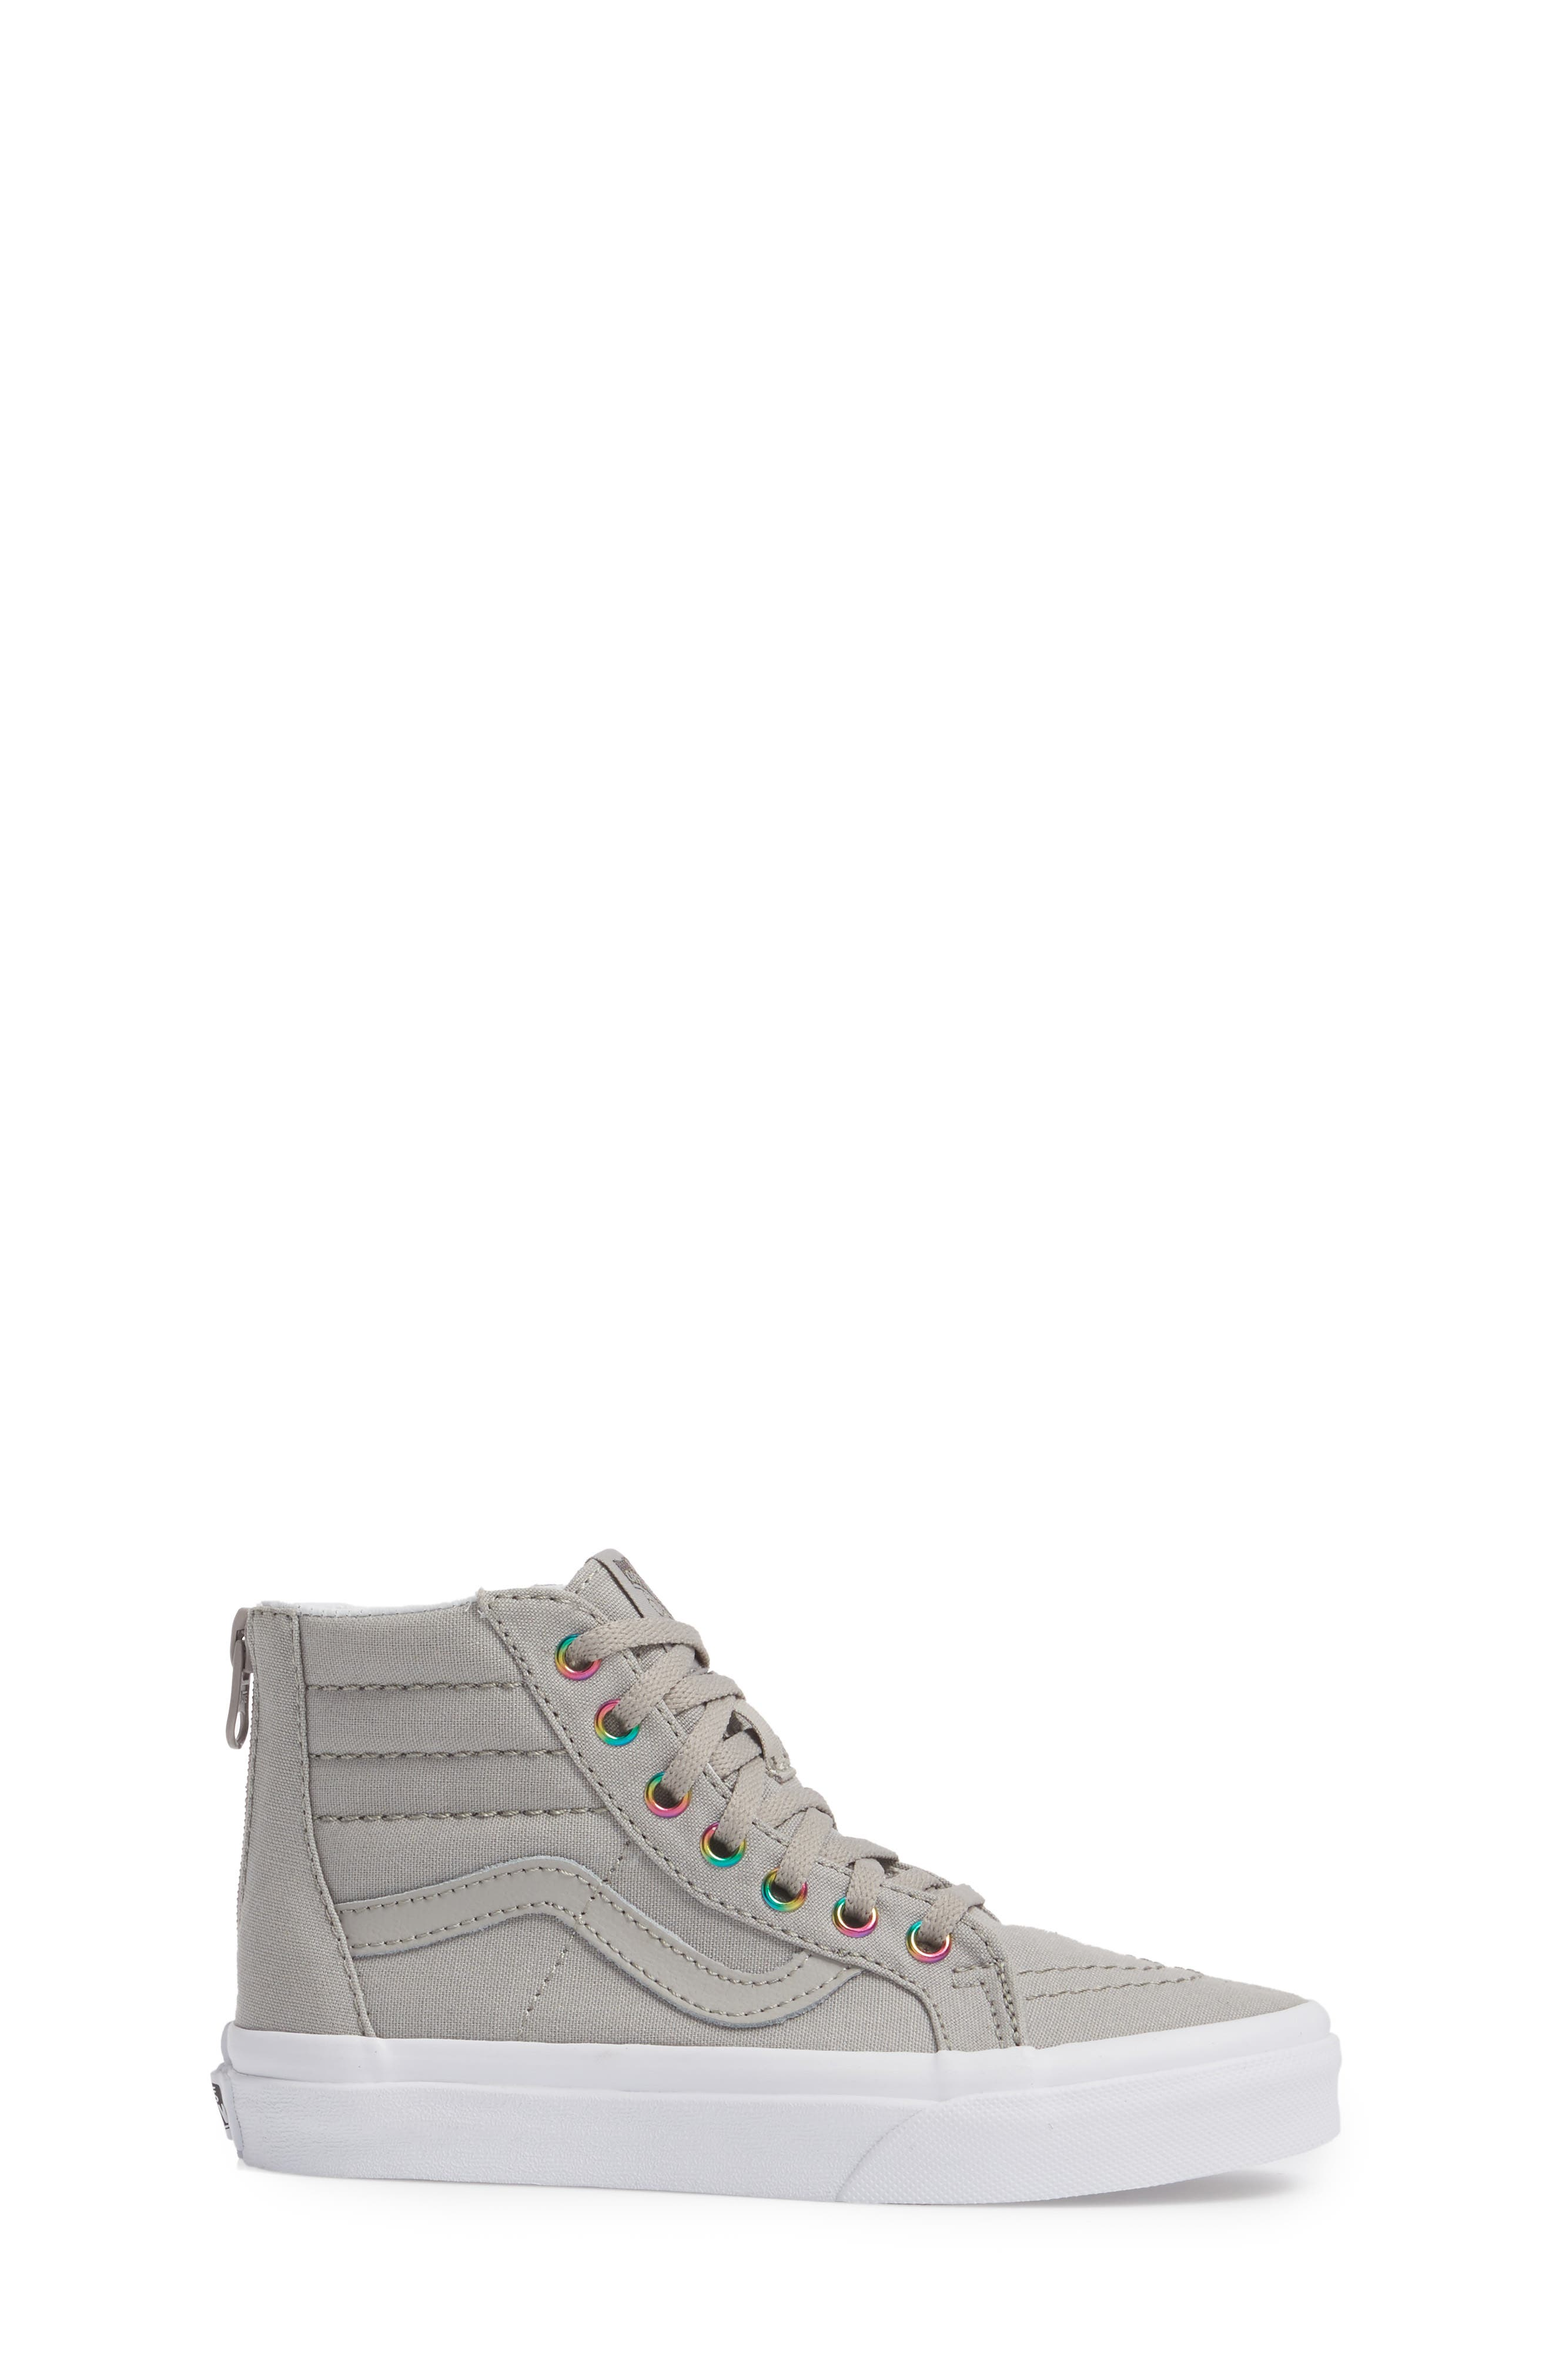 Sk8-Hi Zip High Top Sneaker,                             Alternate thumbnail 3, color,                             Rainbow Eyelet Drizzle